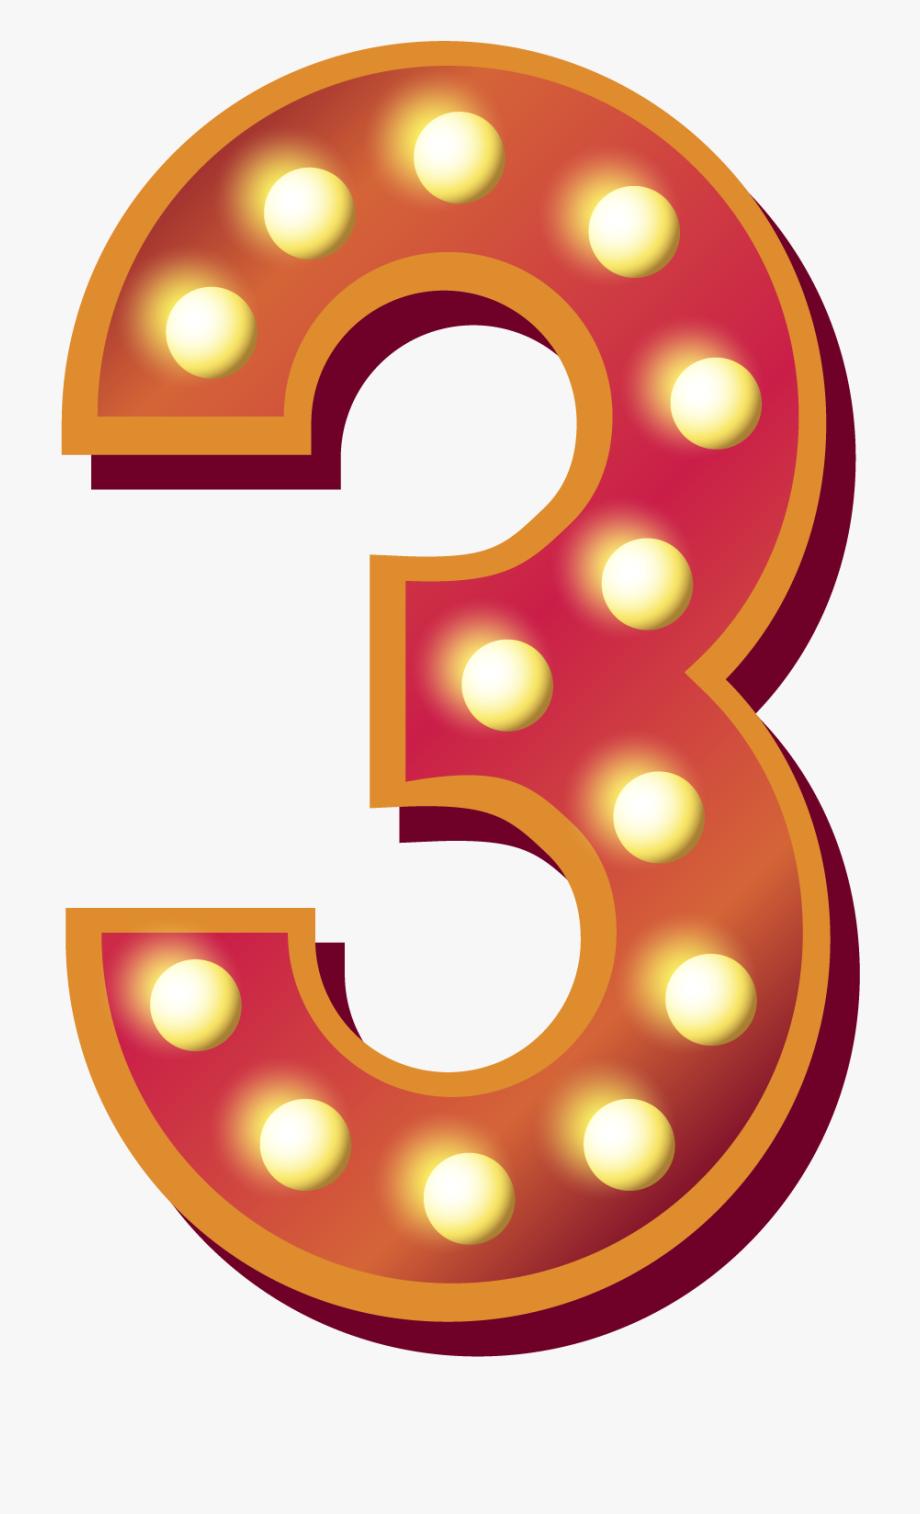 3 Number Png Download Free Image.